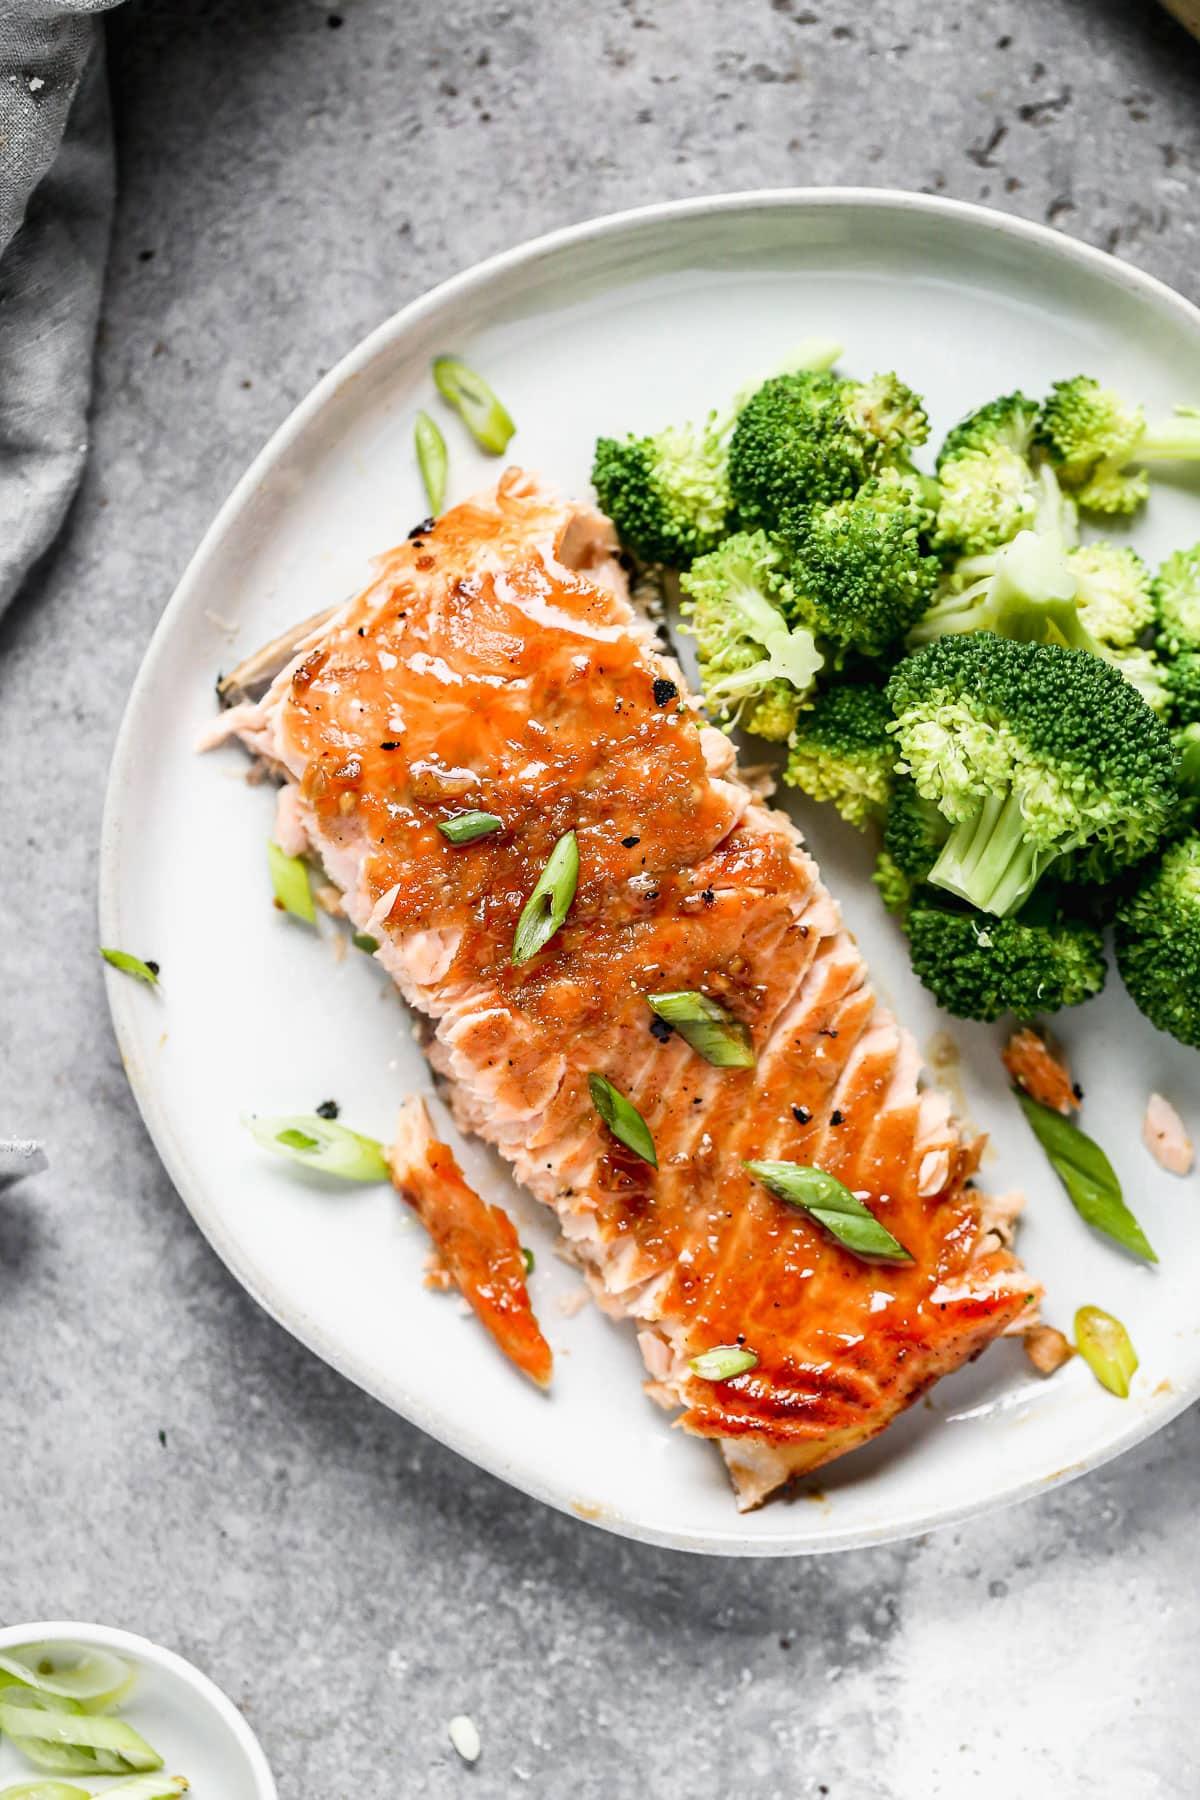 A plate of bourbon glazed salmon and broccoli